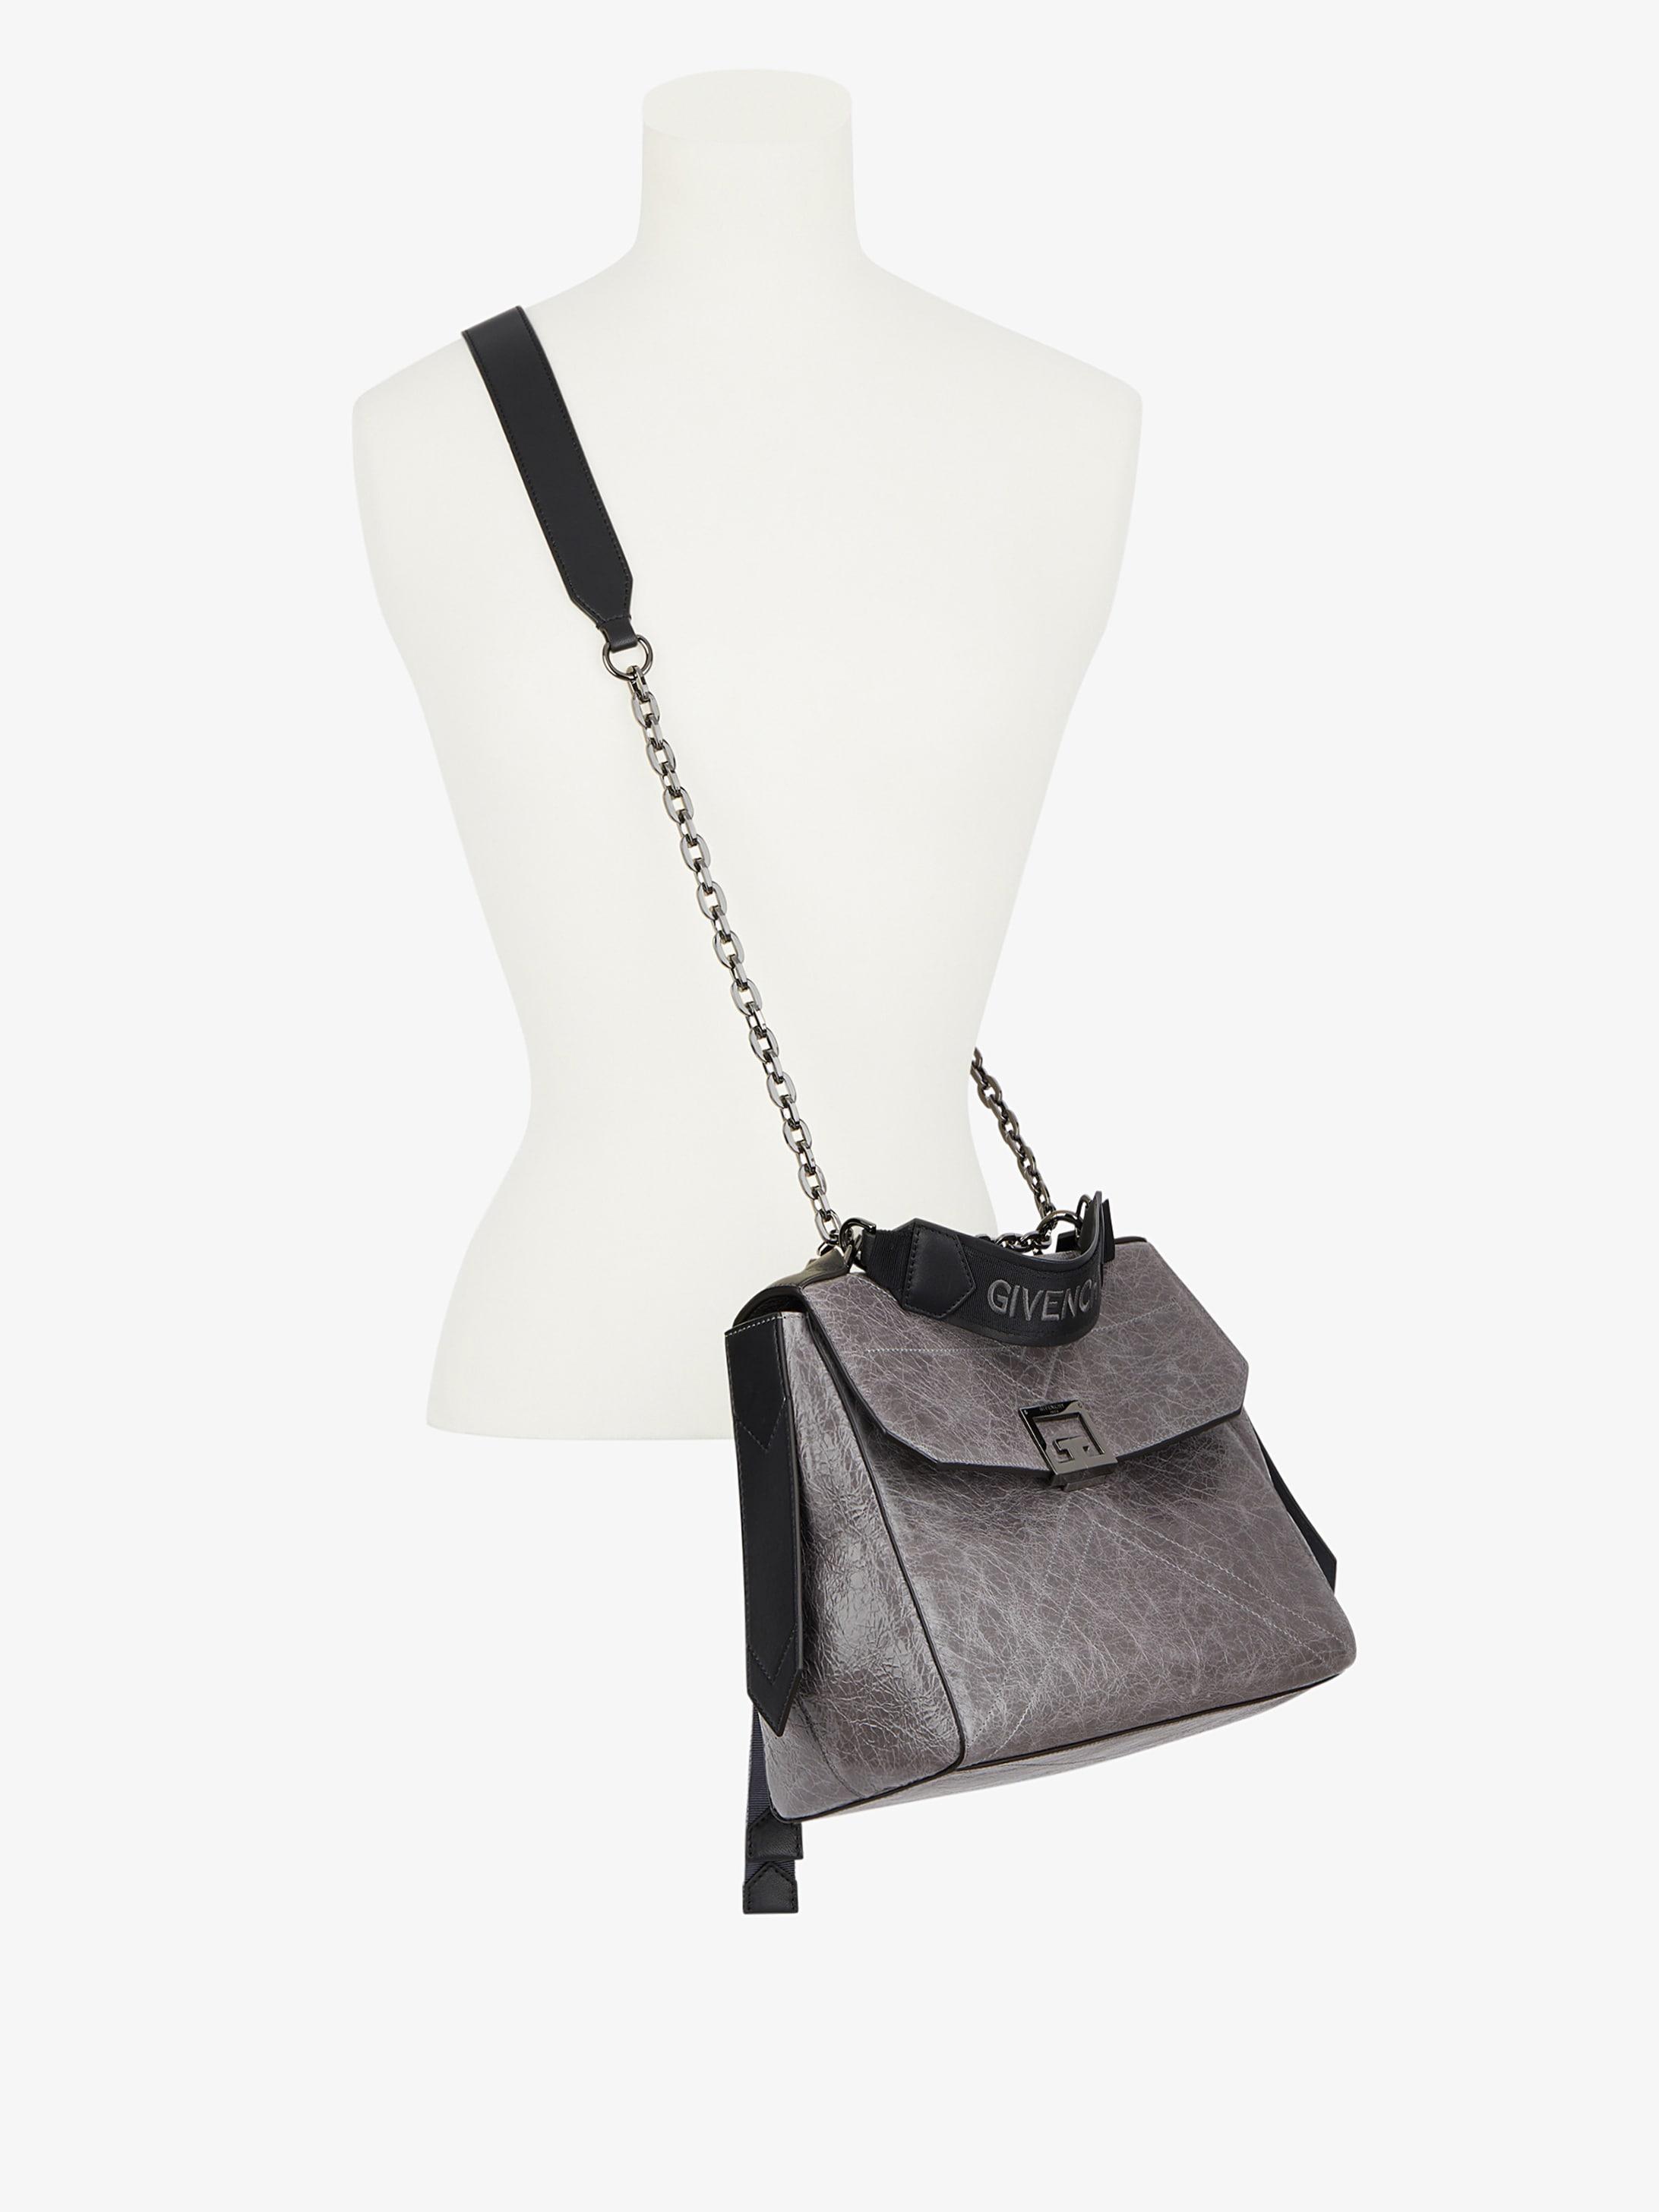 Medium ID bag in cracked leather